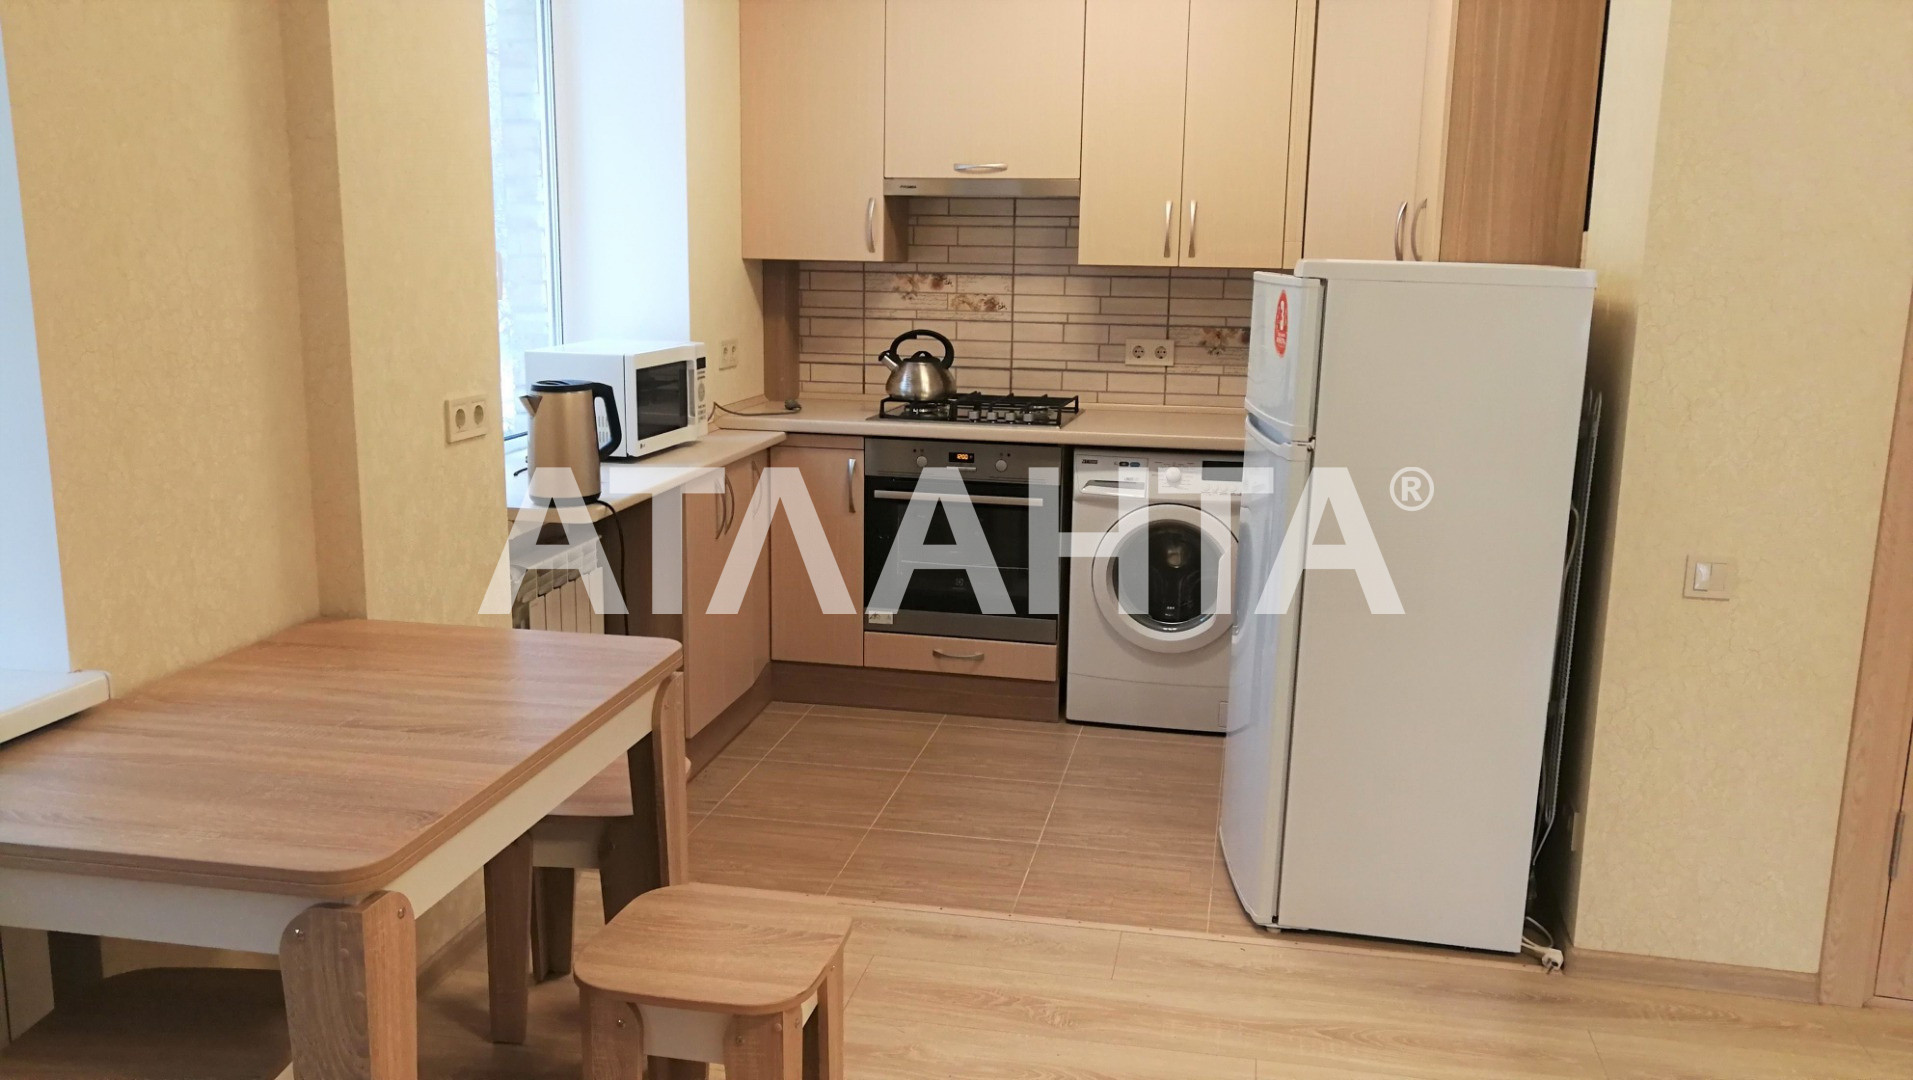 Продается 2-комнатная Квартира на ул. Пер. Ярослава Хомова — 51 000 у.е. (фото №2)